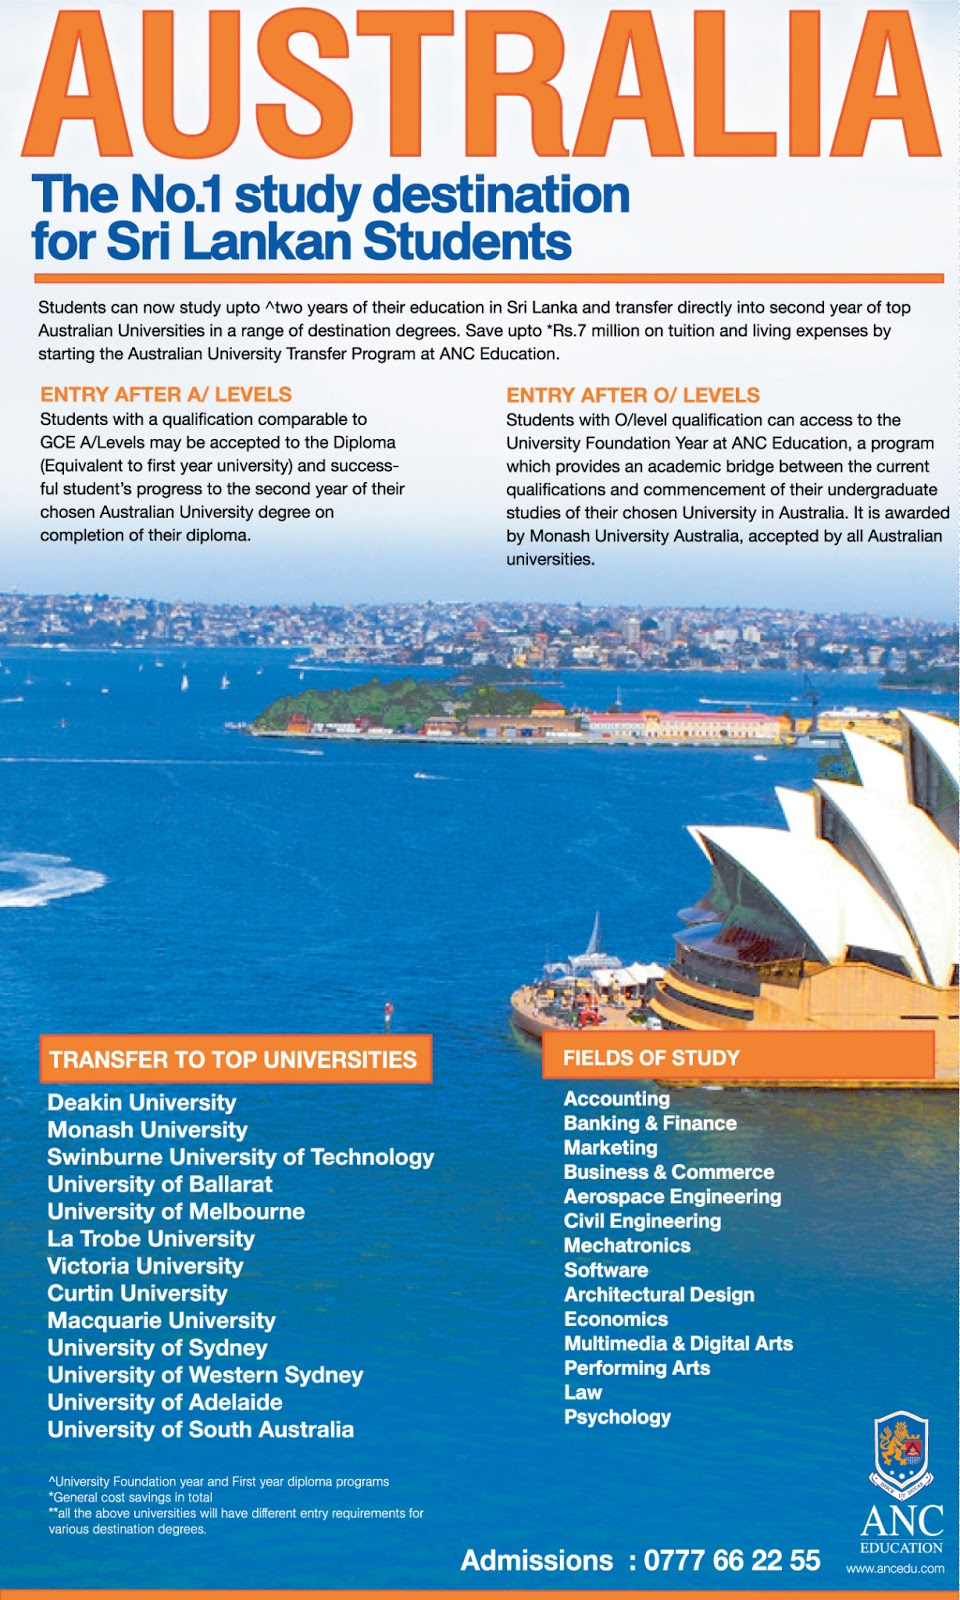 ANC EDUCATION: Australia, the No 1 study destination for Sri ...